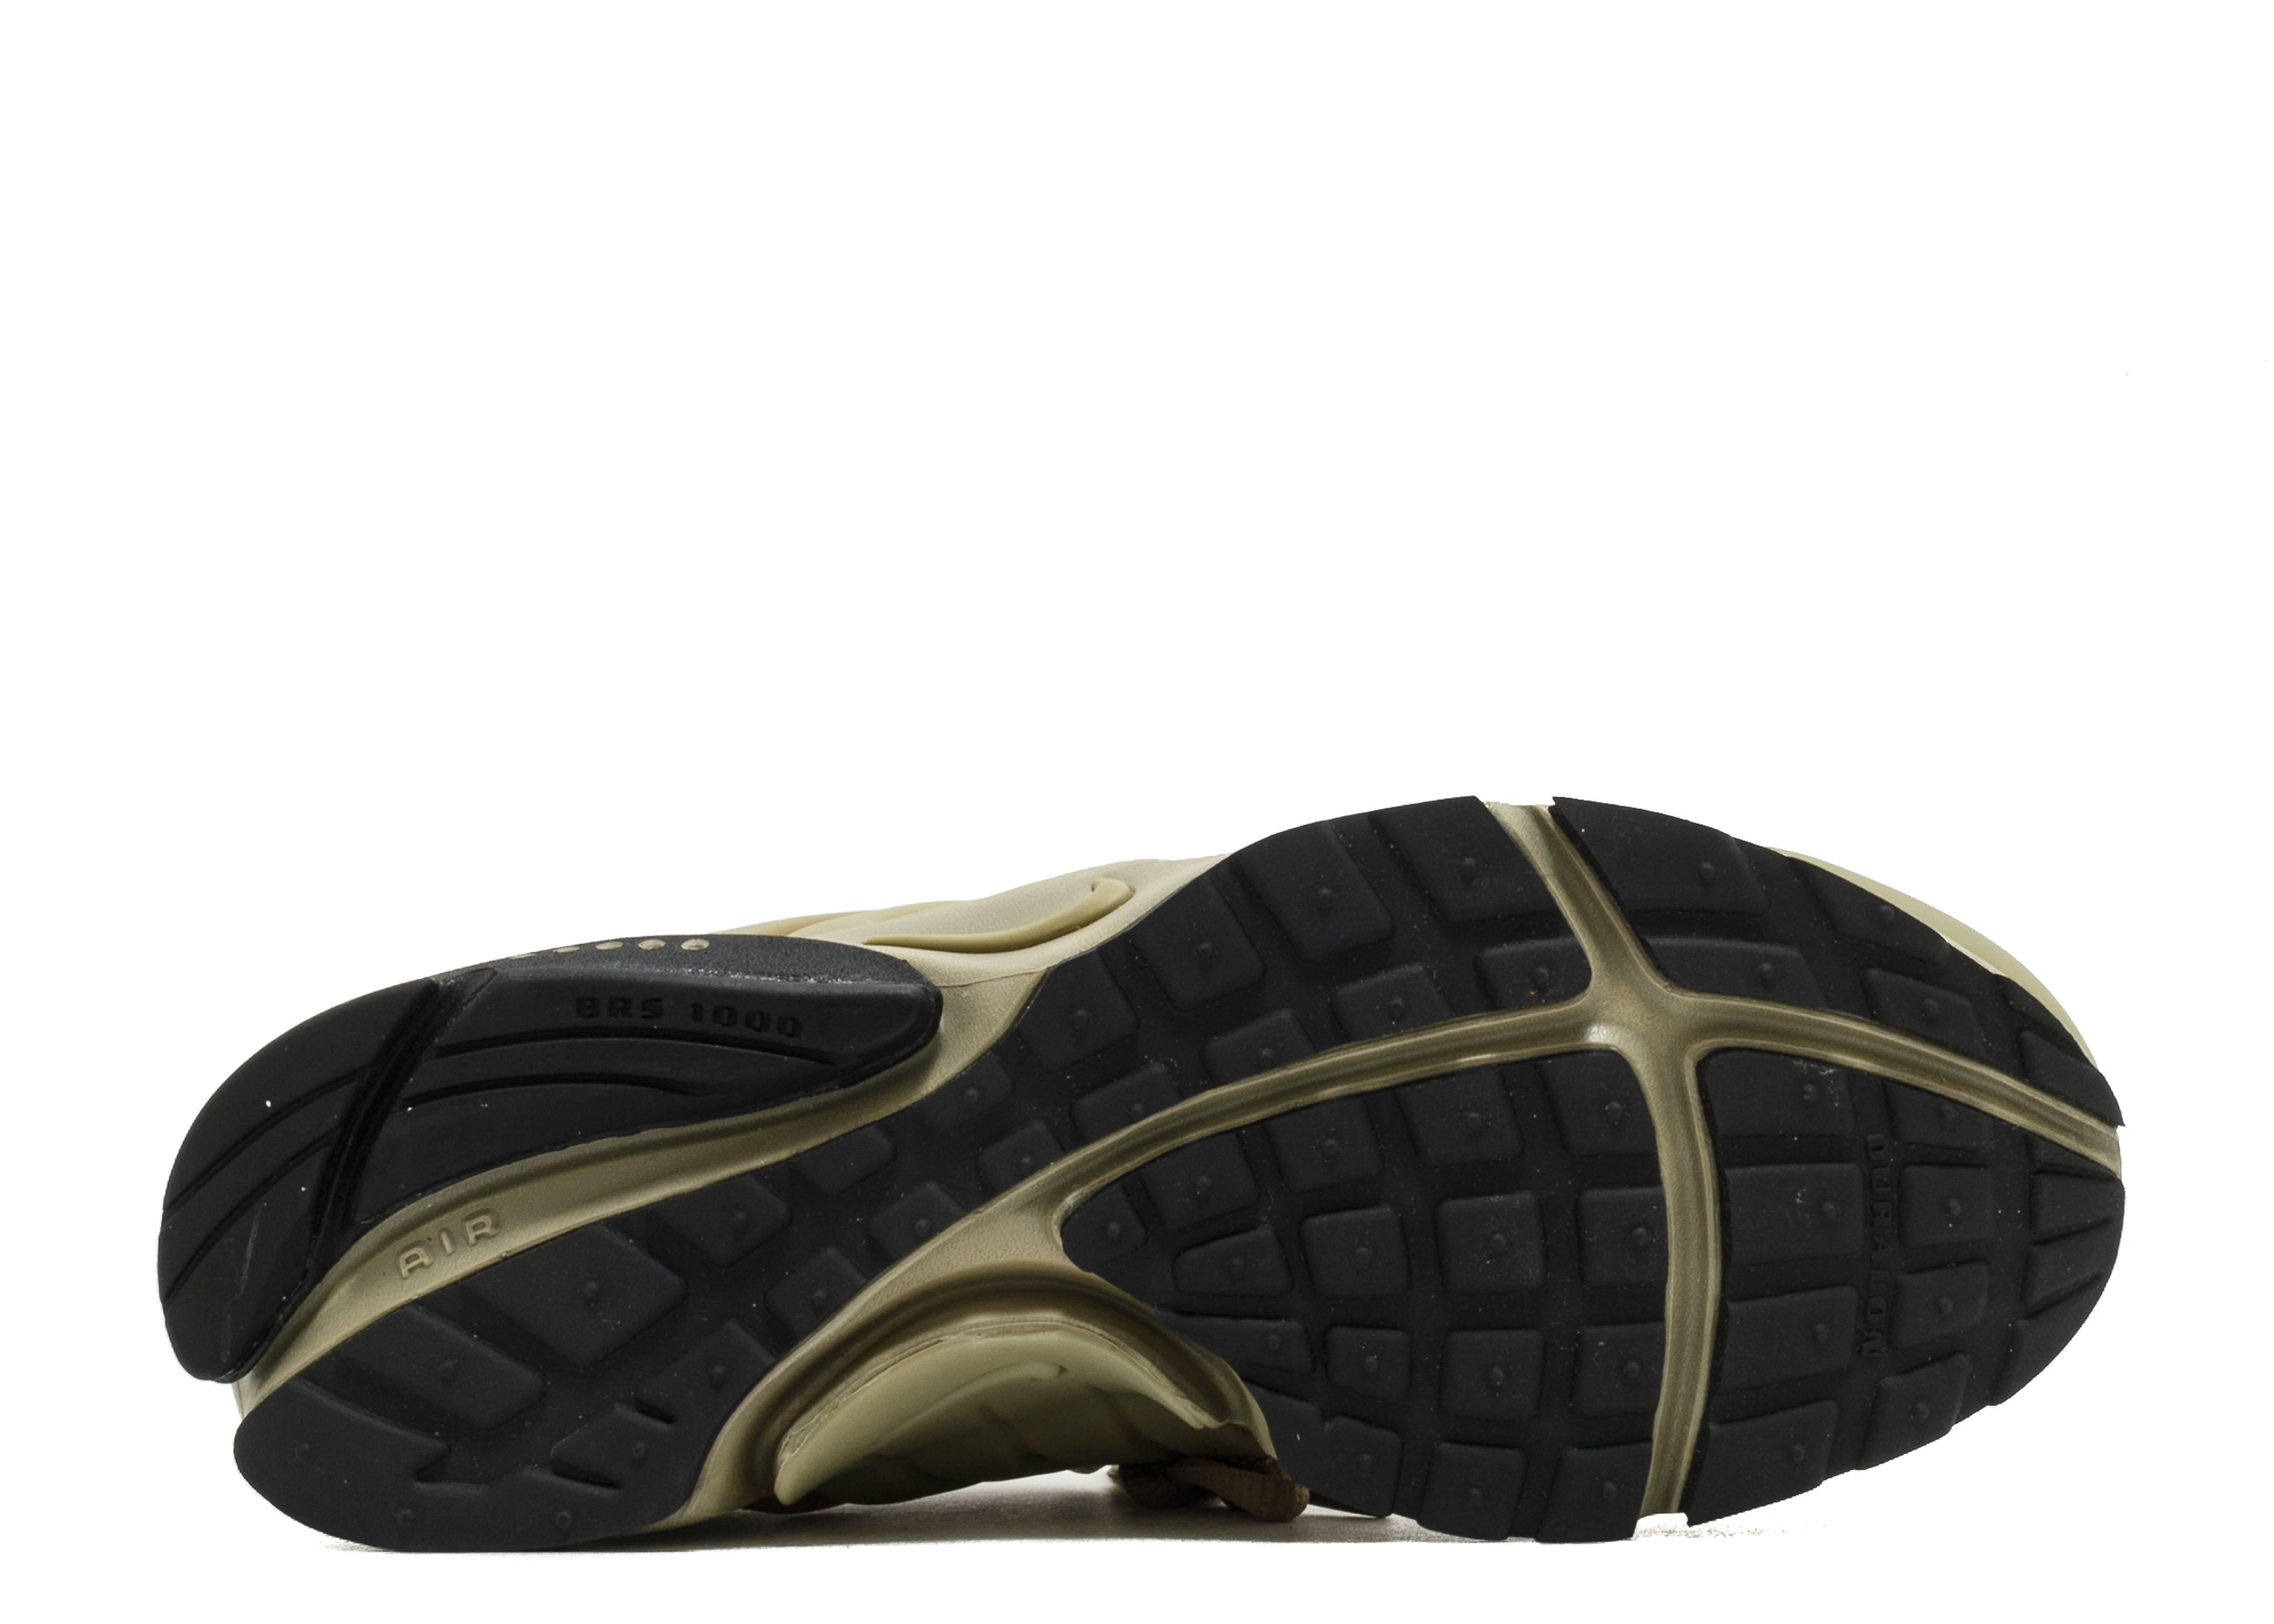 5da19f5a7b6af Air Presto Se - Nike - 848186 200 - neutral olive/neutral olive ...